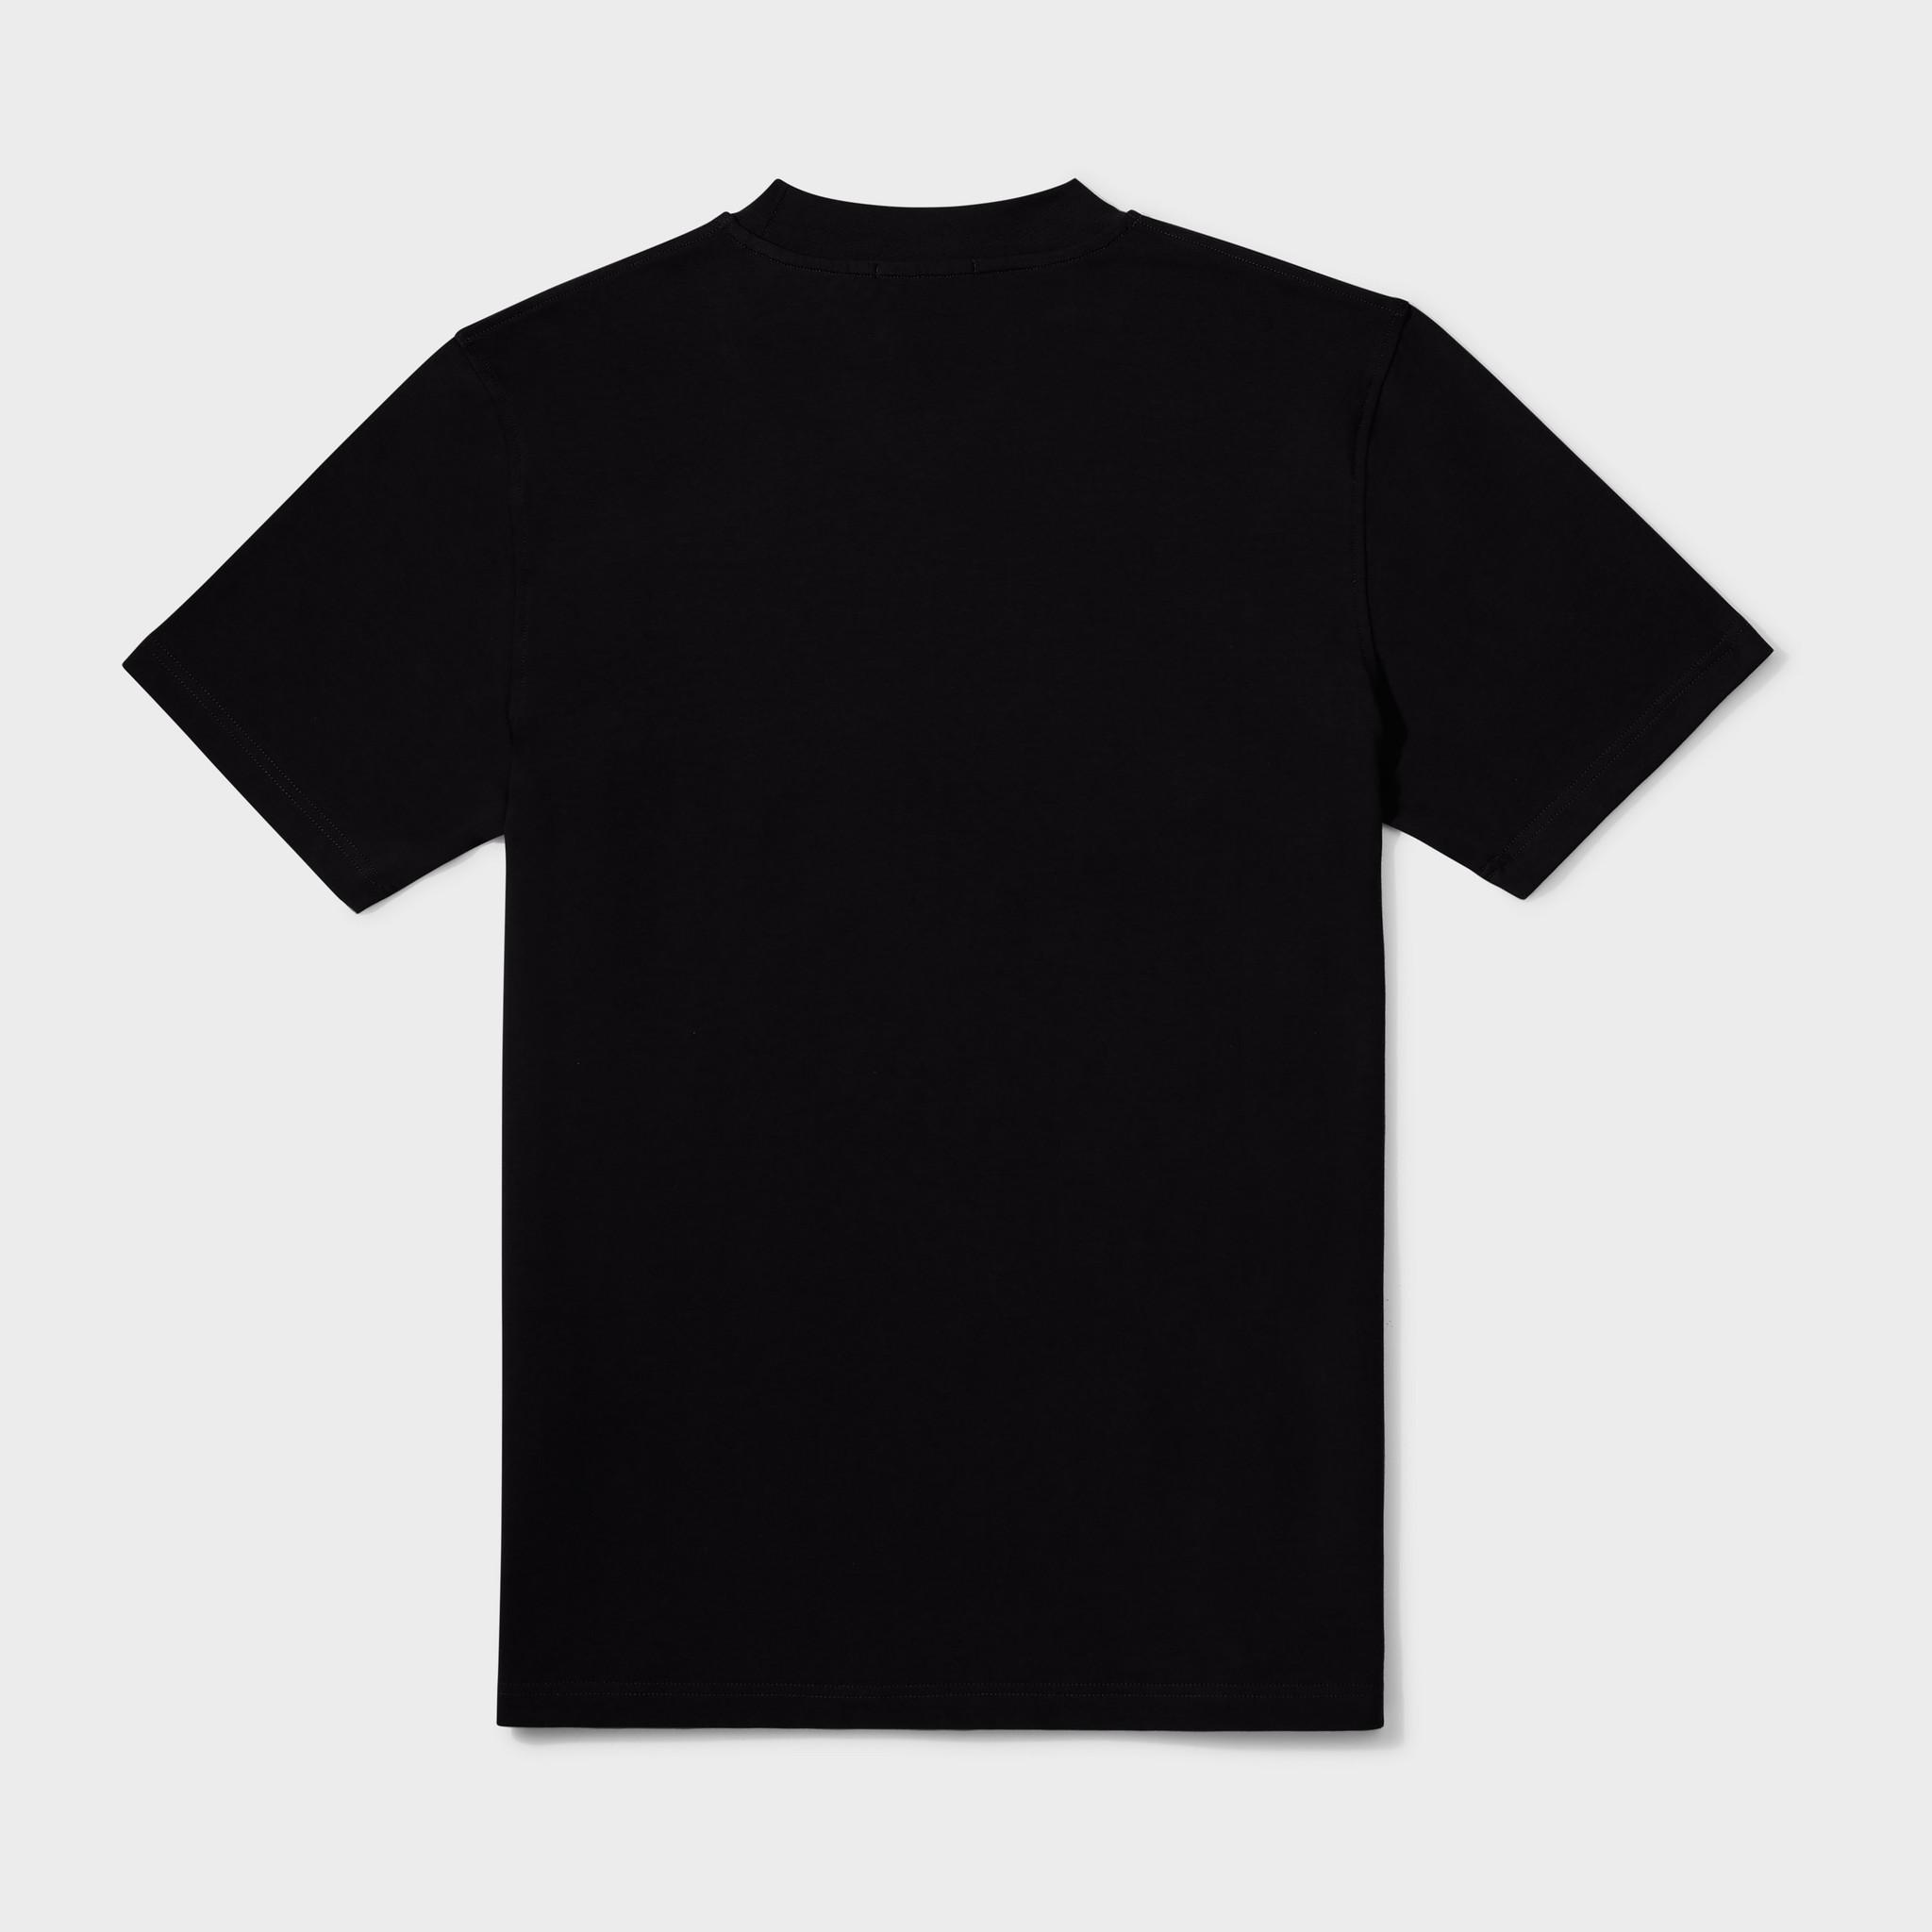 WAFI SIGNATURE TEE BLACK / NEON YELLOW-2